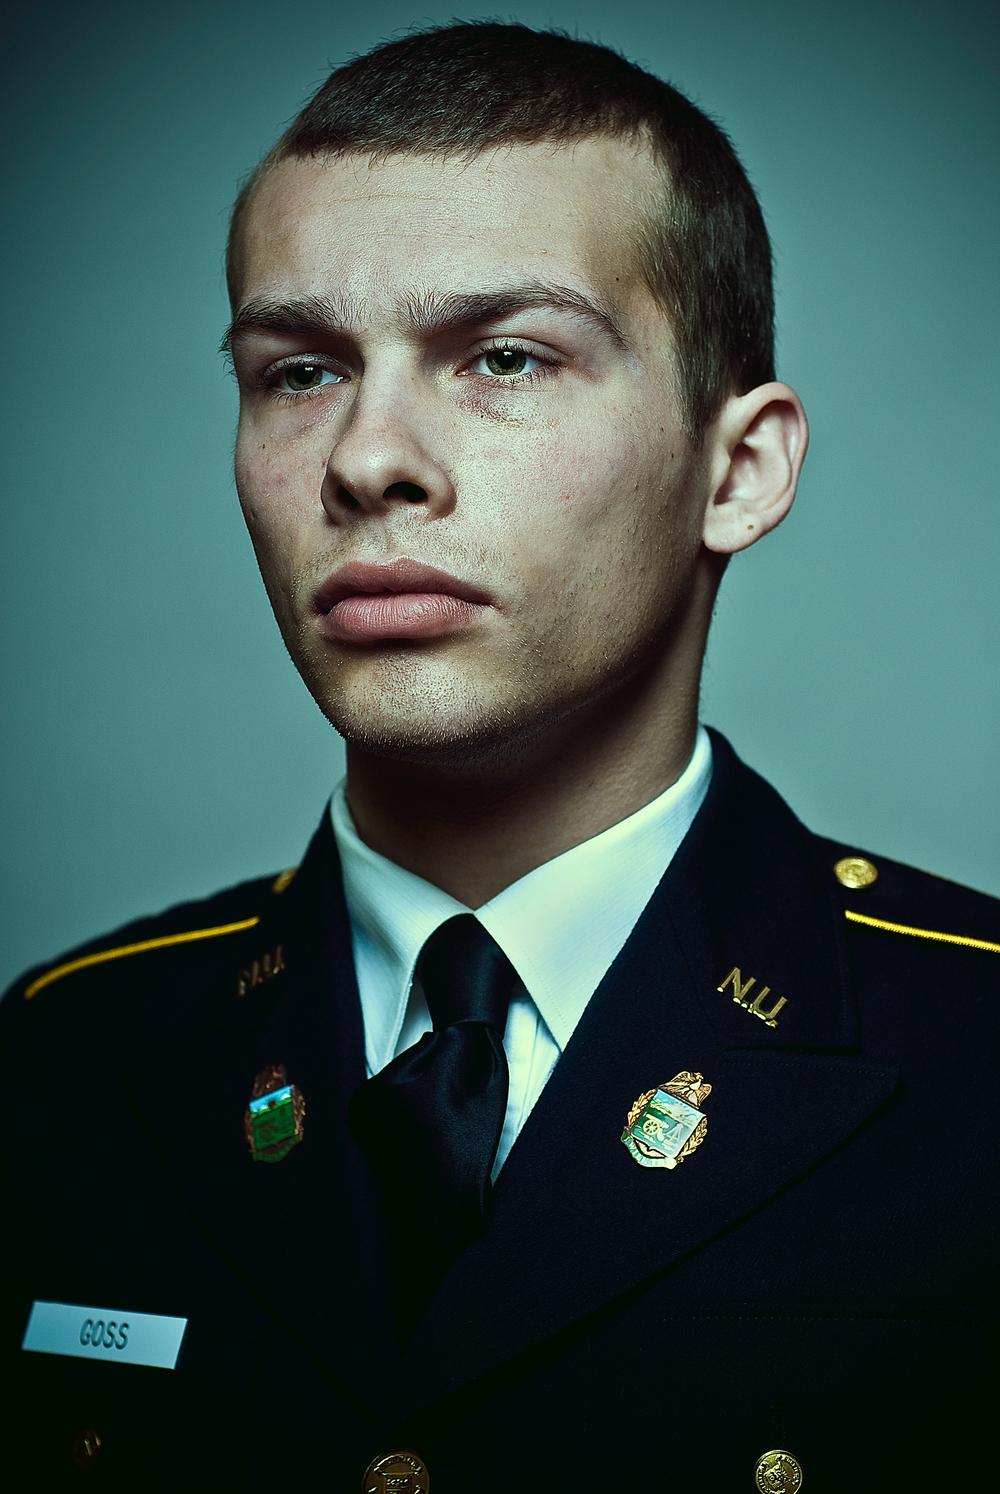 military portrait 2